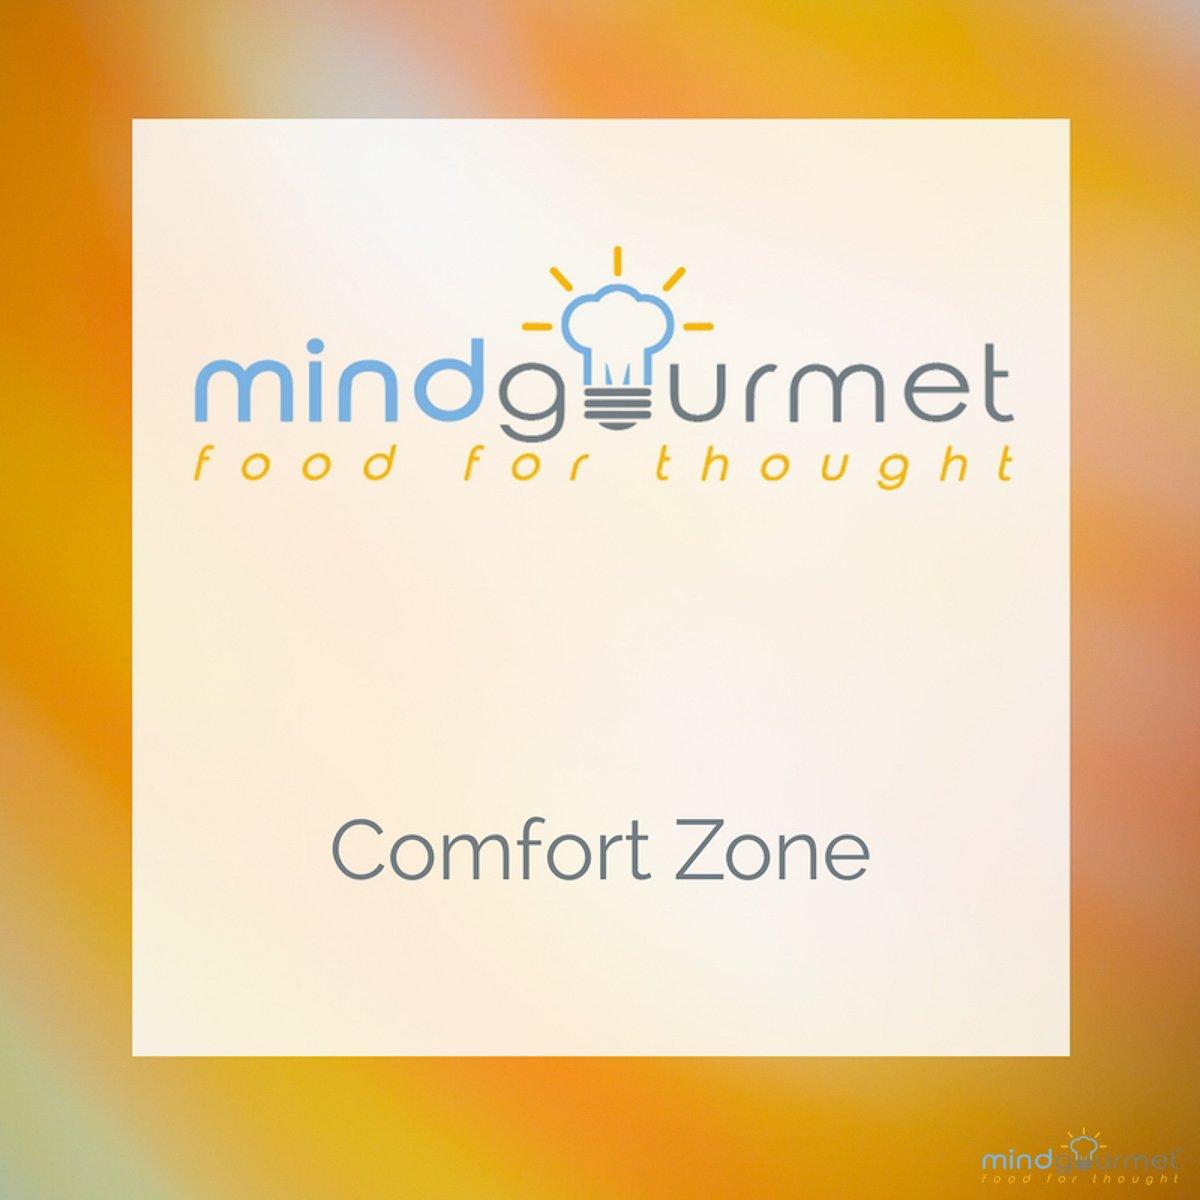 MindGourmet&#39;s inspirational Comfort Zone quotes on Vimeo #comfortzone #comfortzoneweek #catchoftheday  https:// vimeo.com/243085991  &nbsp;  <br>http://pic.twitter.com/eJOWB9cIBg